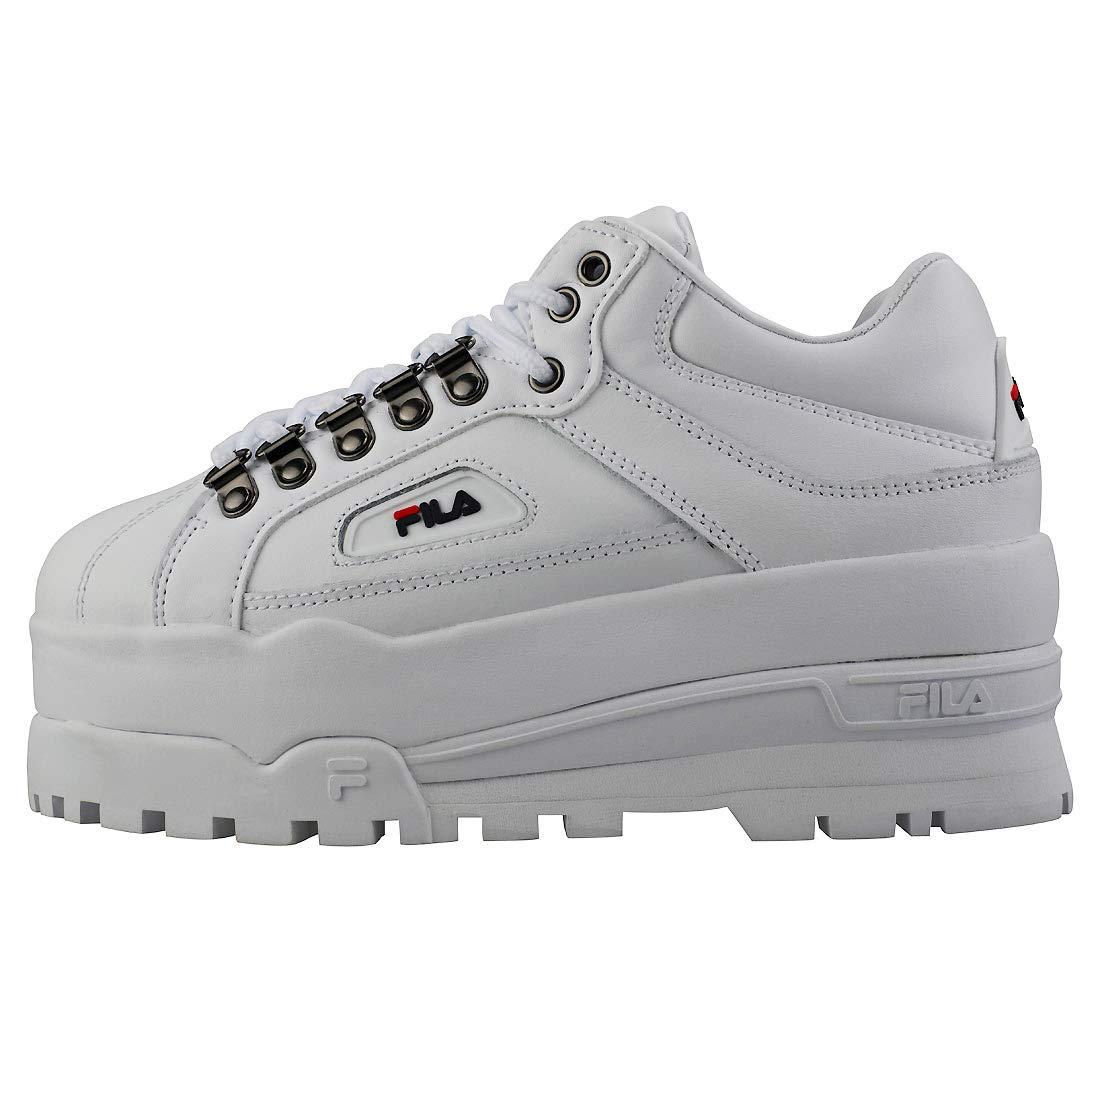 be5206278bd0 Amazon.com  Fila Trailblazer Wedge Womens Sneakers White  Clothing